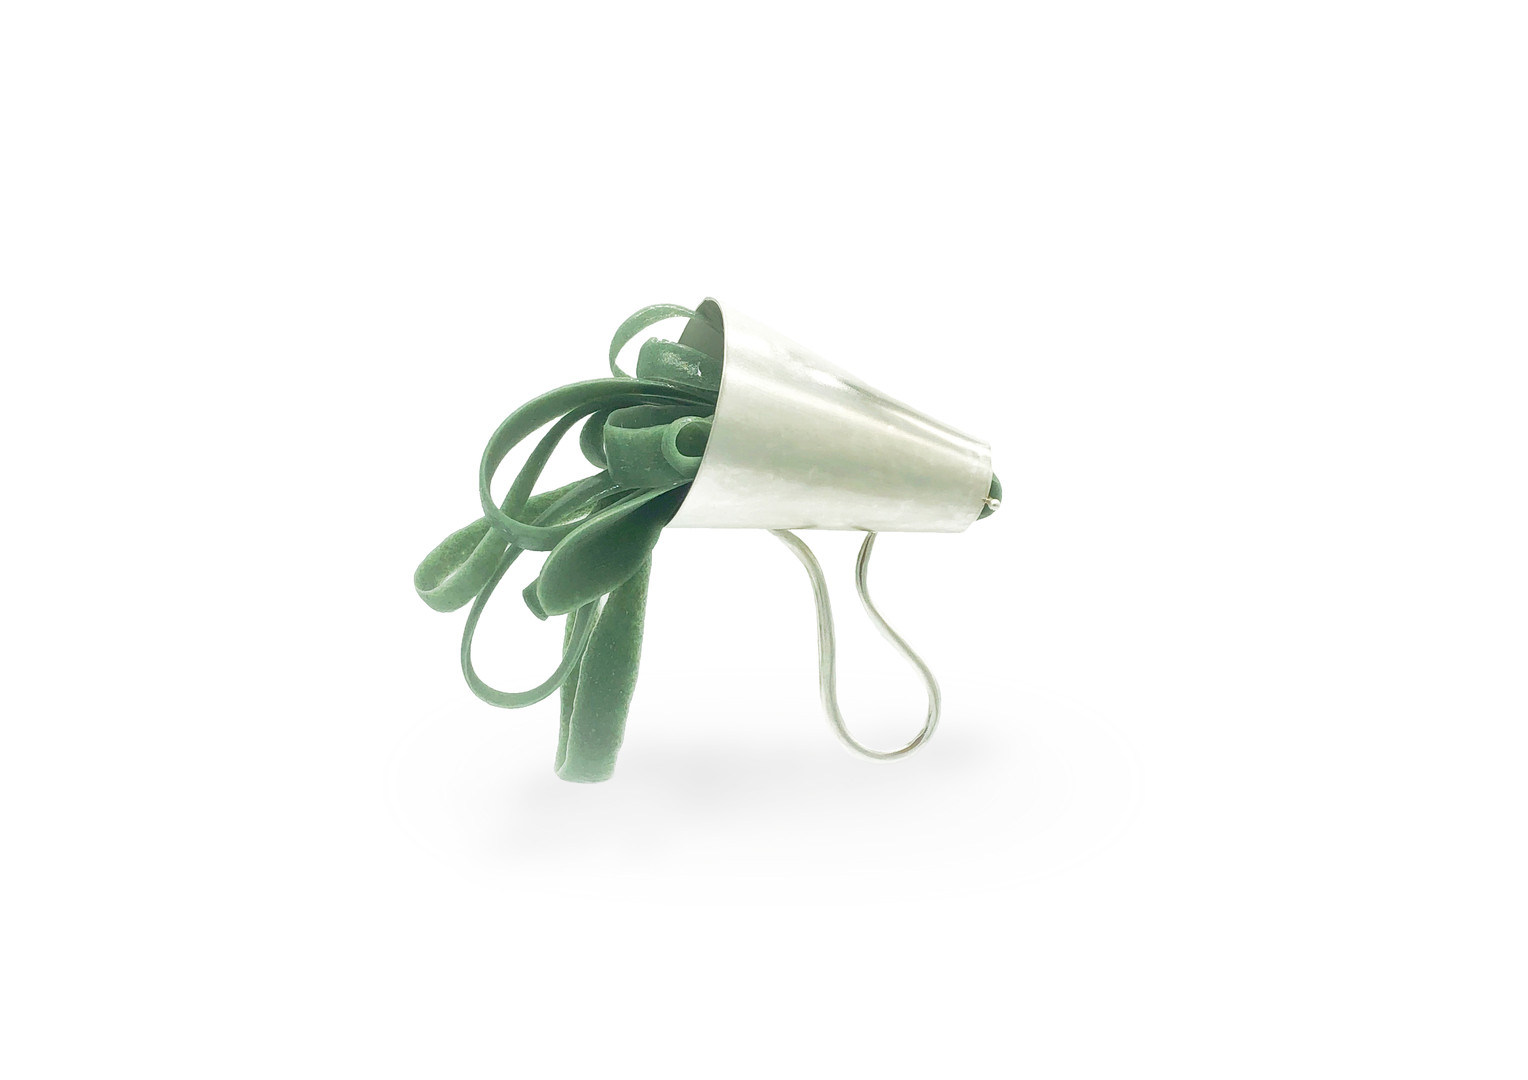 StinaWen-Dripping-01.jpg